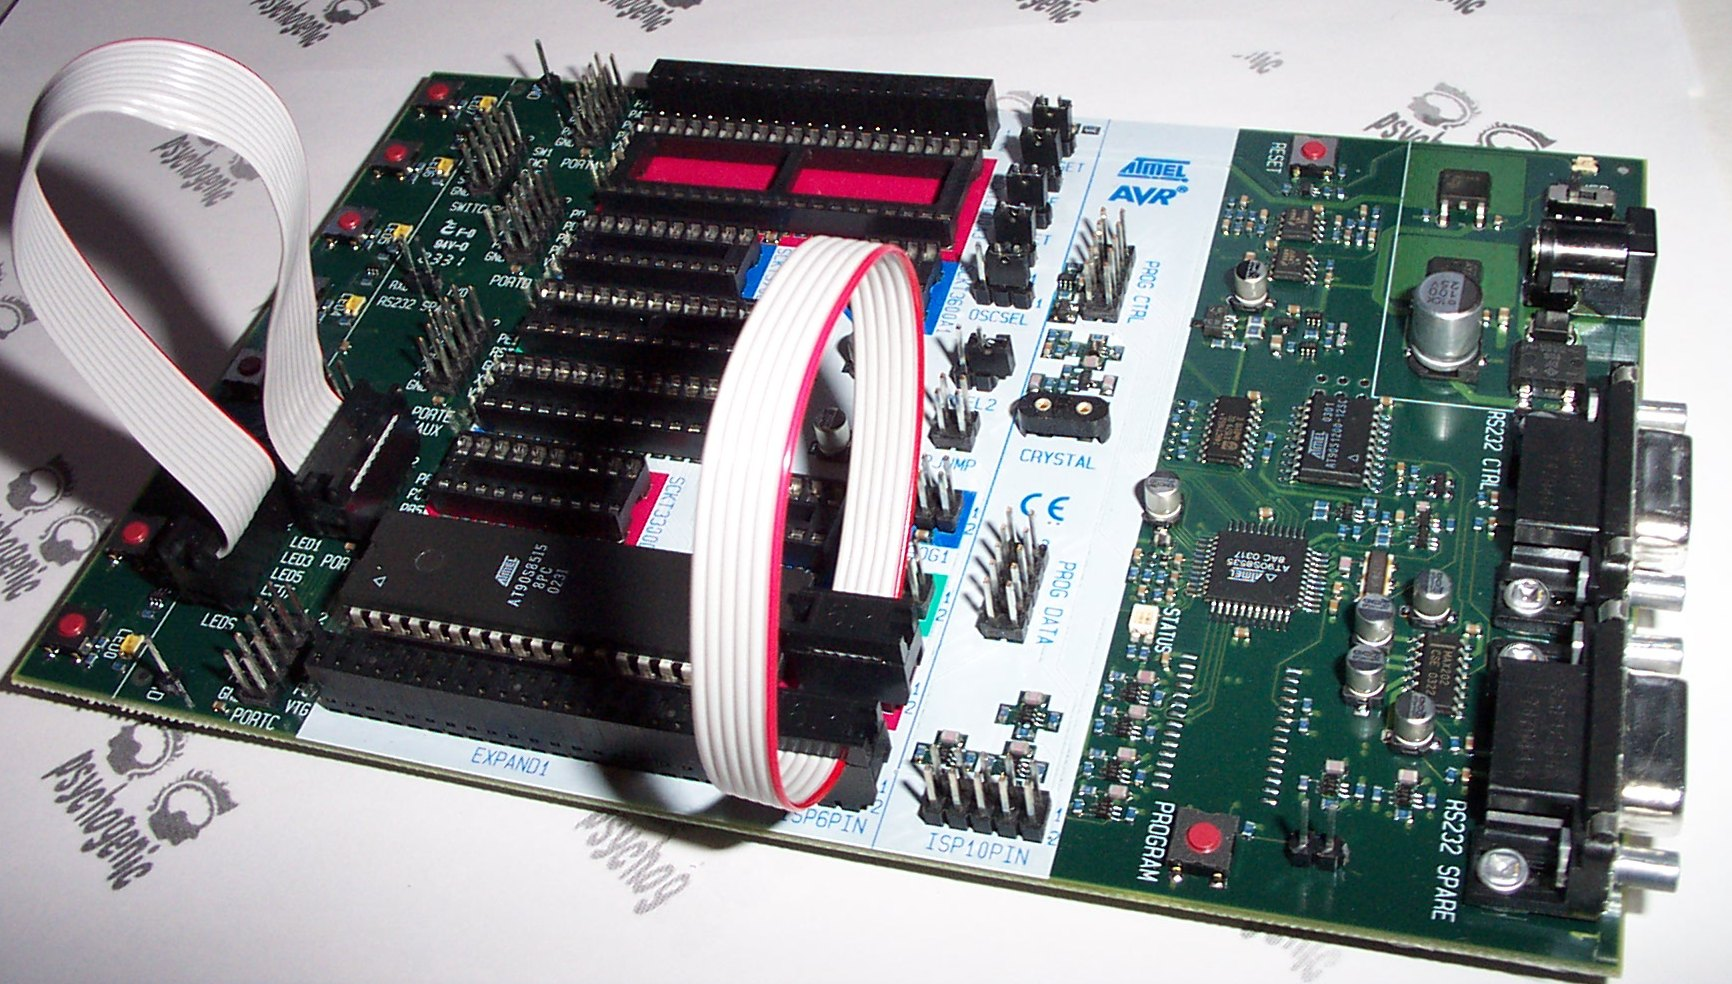 Developing For The Atmel Avr Microcontroller On Linux Standard Library 038 String Formatting Figure 3 Stk500 Development Kit